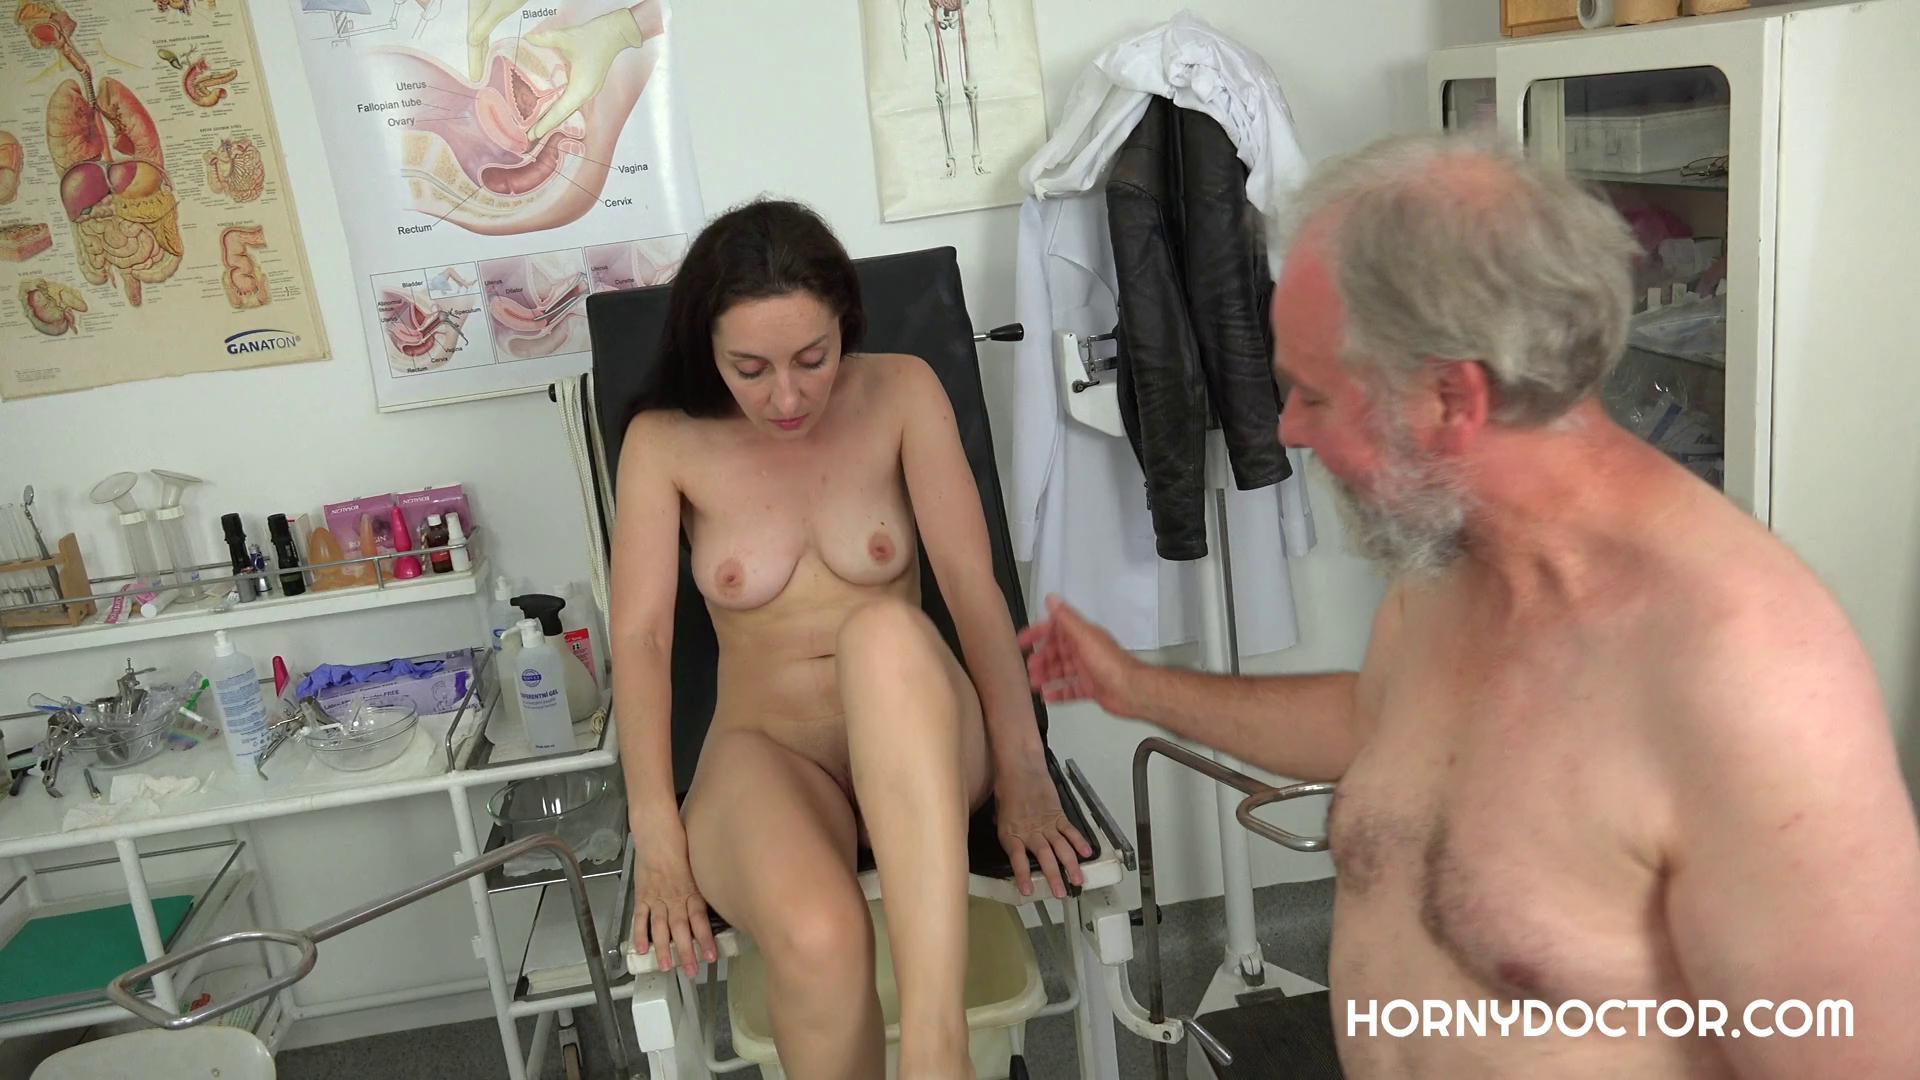 HornyDoctor – Didevi